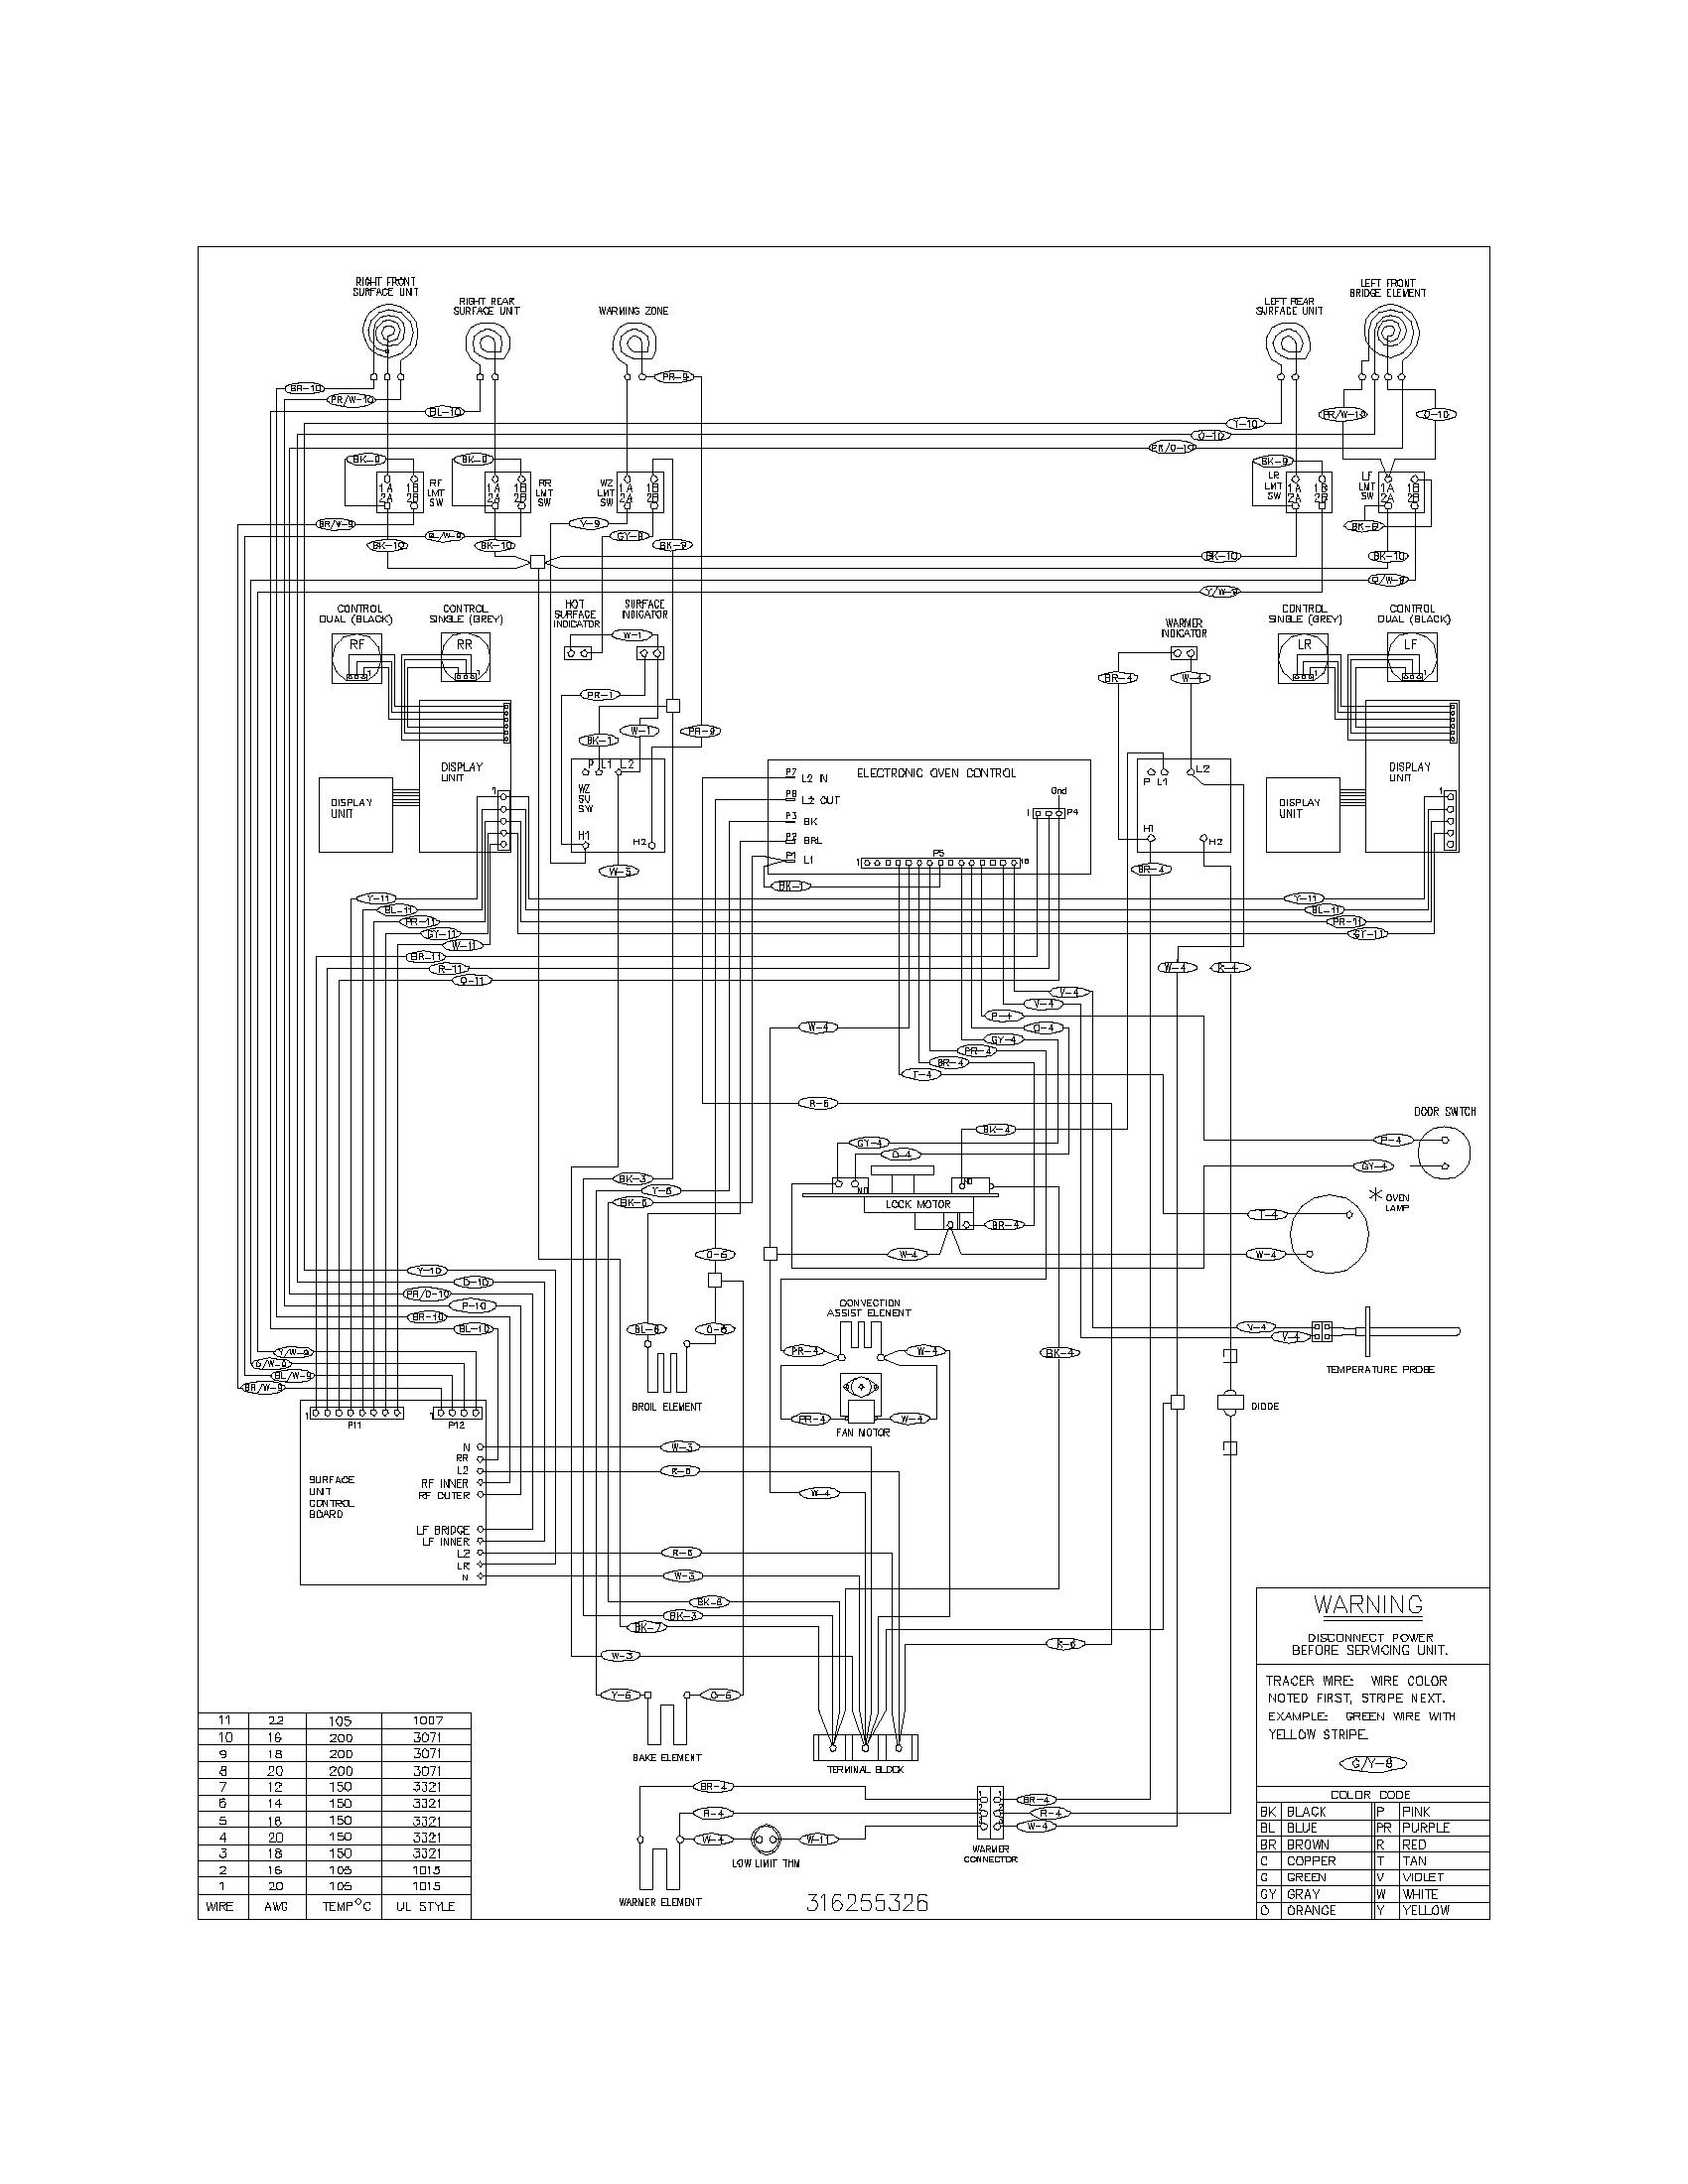 Frigidaire Plef398ccd Electric Range Timer